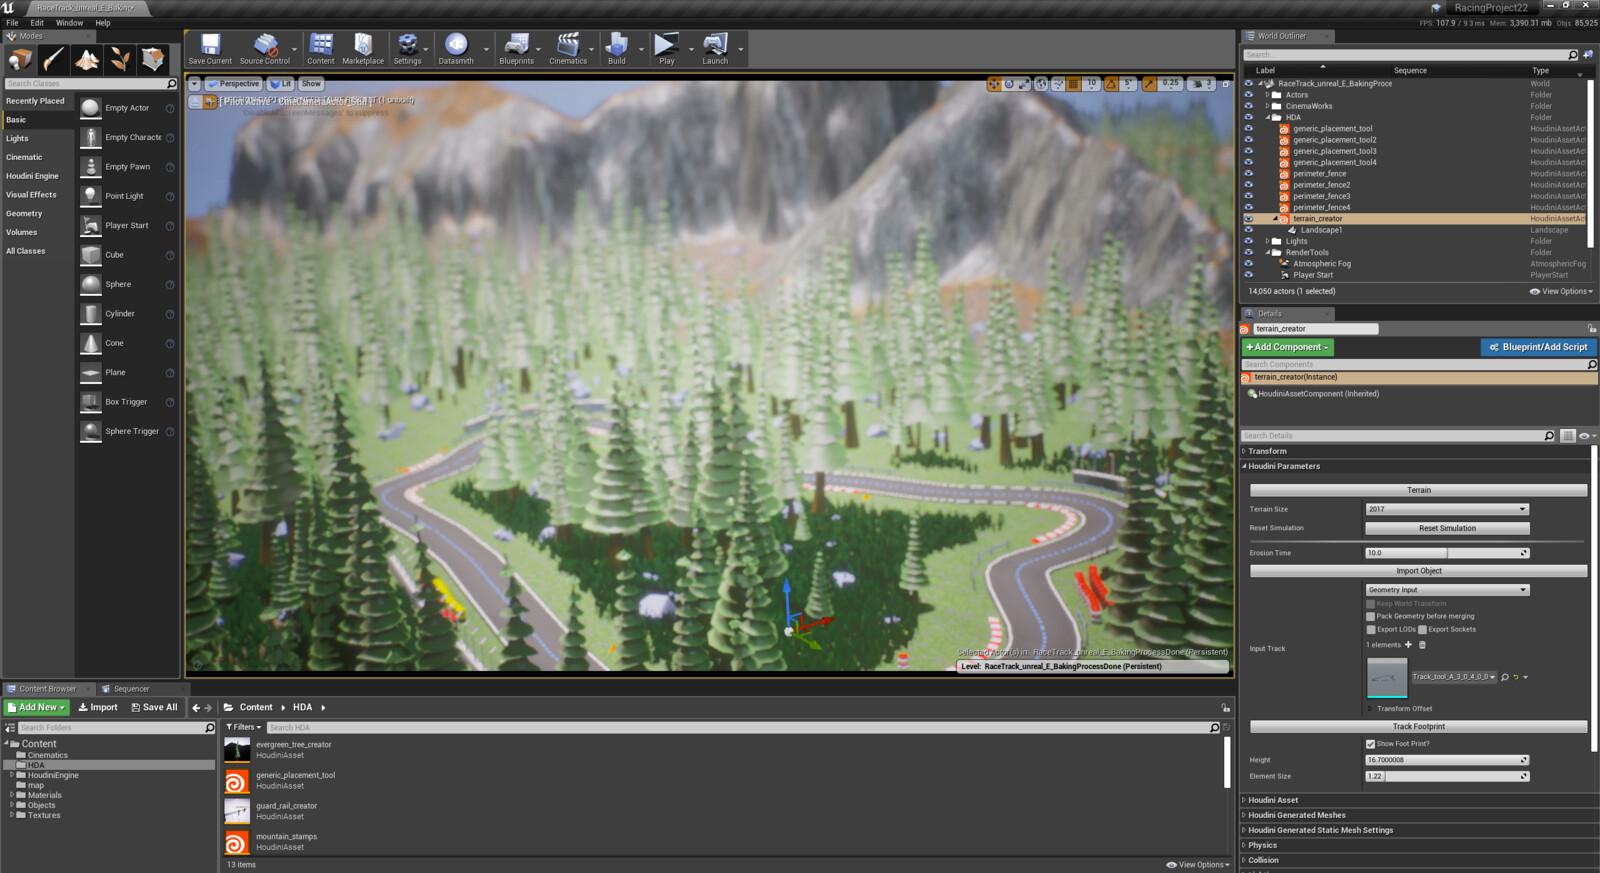 HDA file interface in Unreal Engine